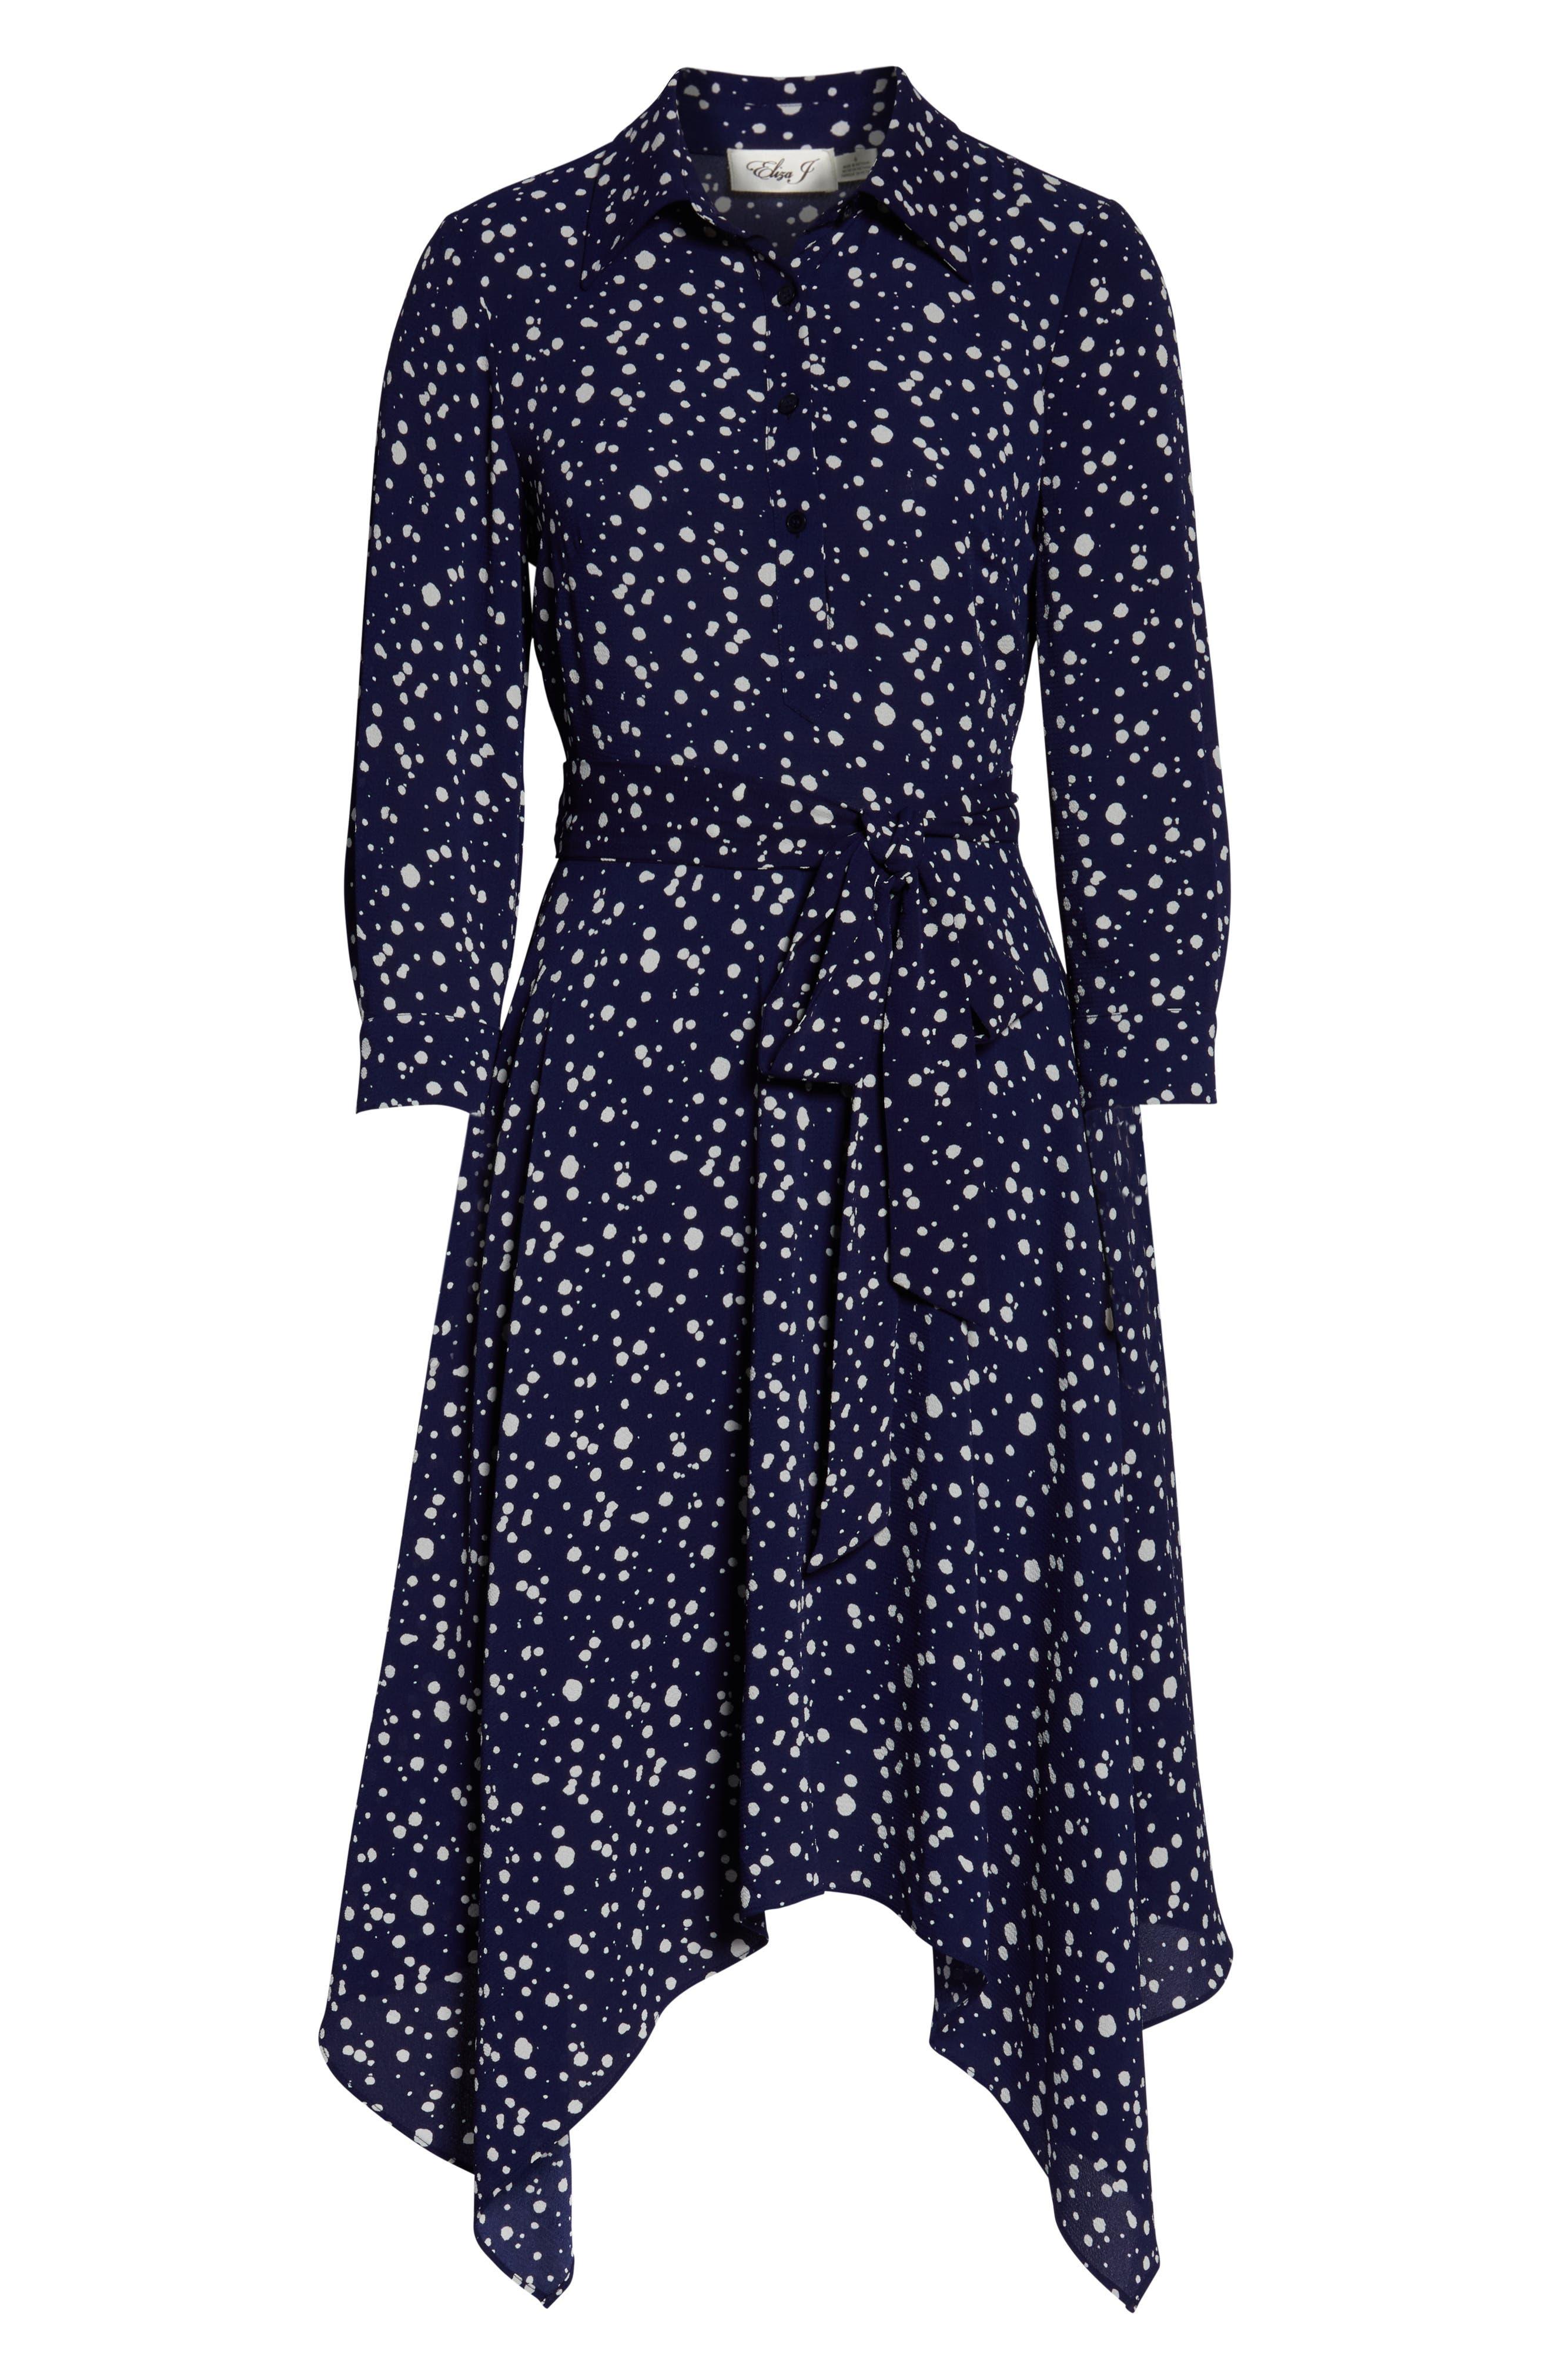 ELIZA J, Handkerchief Hem Midi Dress, Alternate thumbnail 7, color, 410